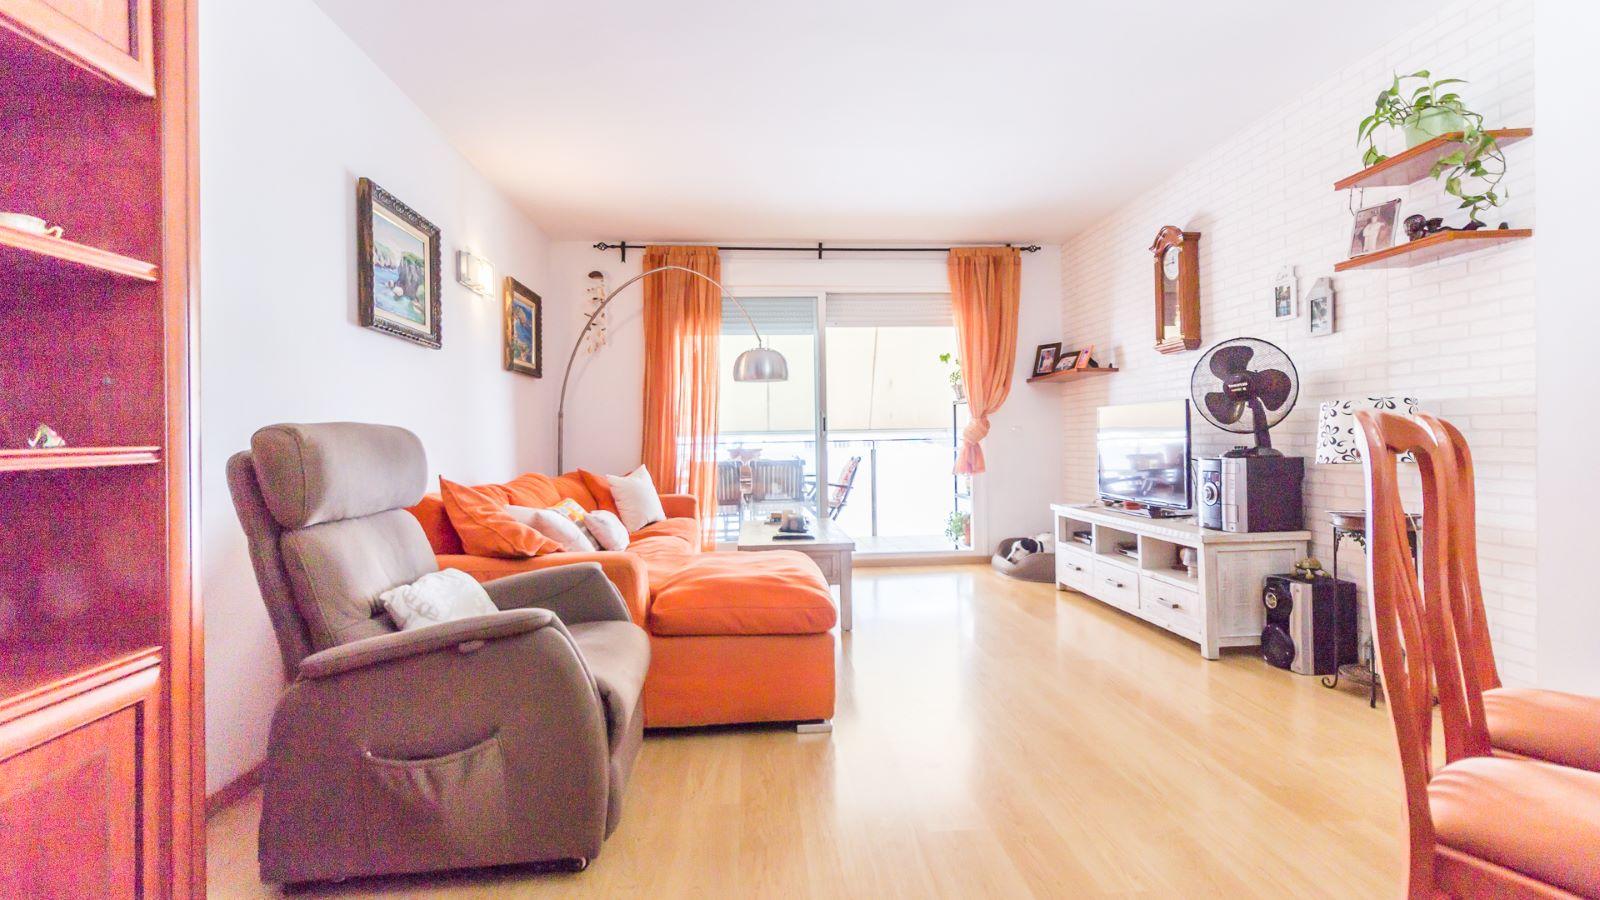 Flat in Zona Vives Llull Ref: HM2359 1